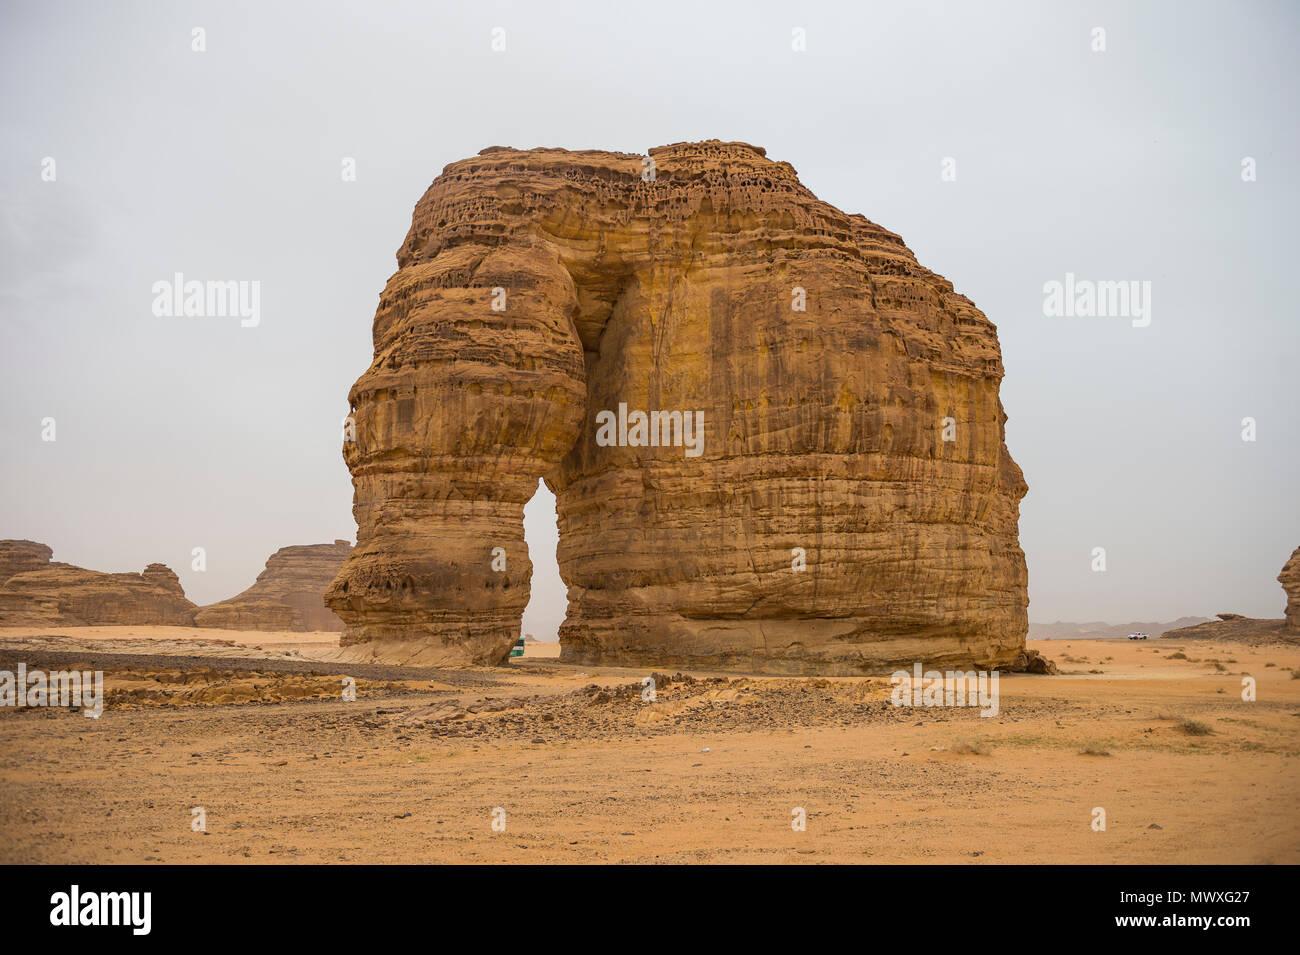 Giant arch in the Elephant rock, Al Ula, Saudi Arabia, Middle East - Stock Image